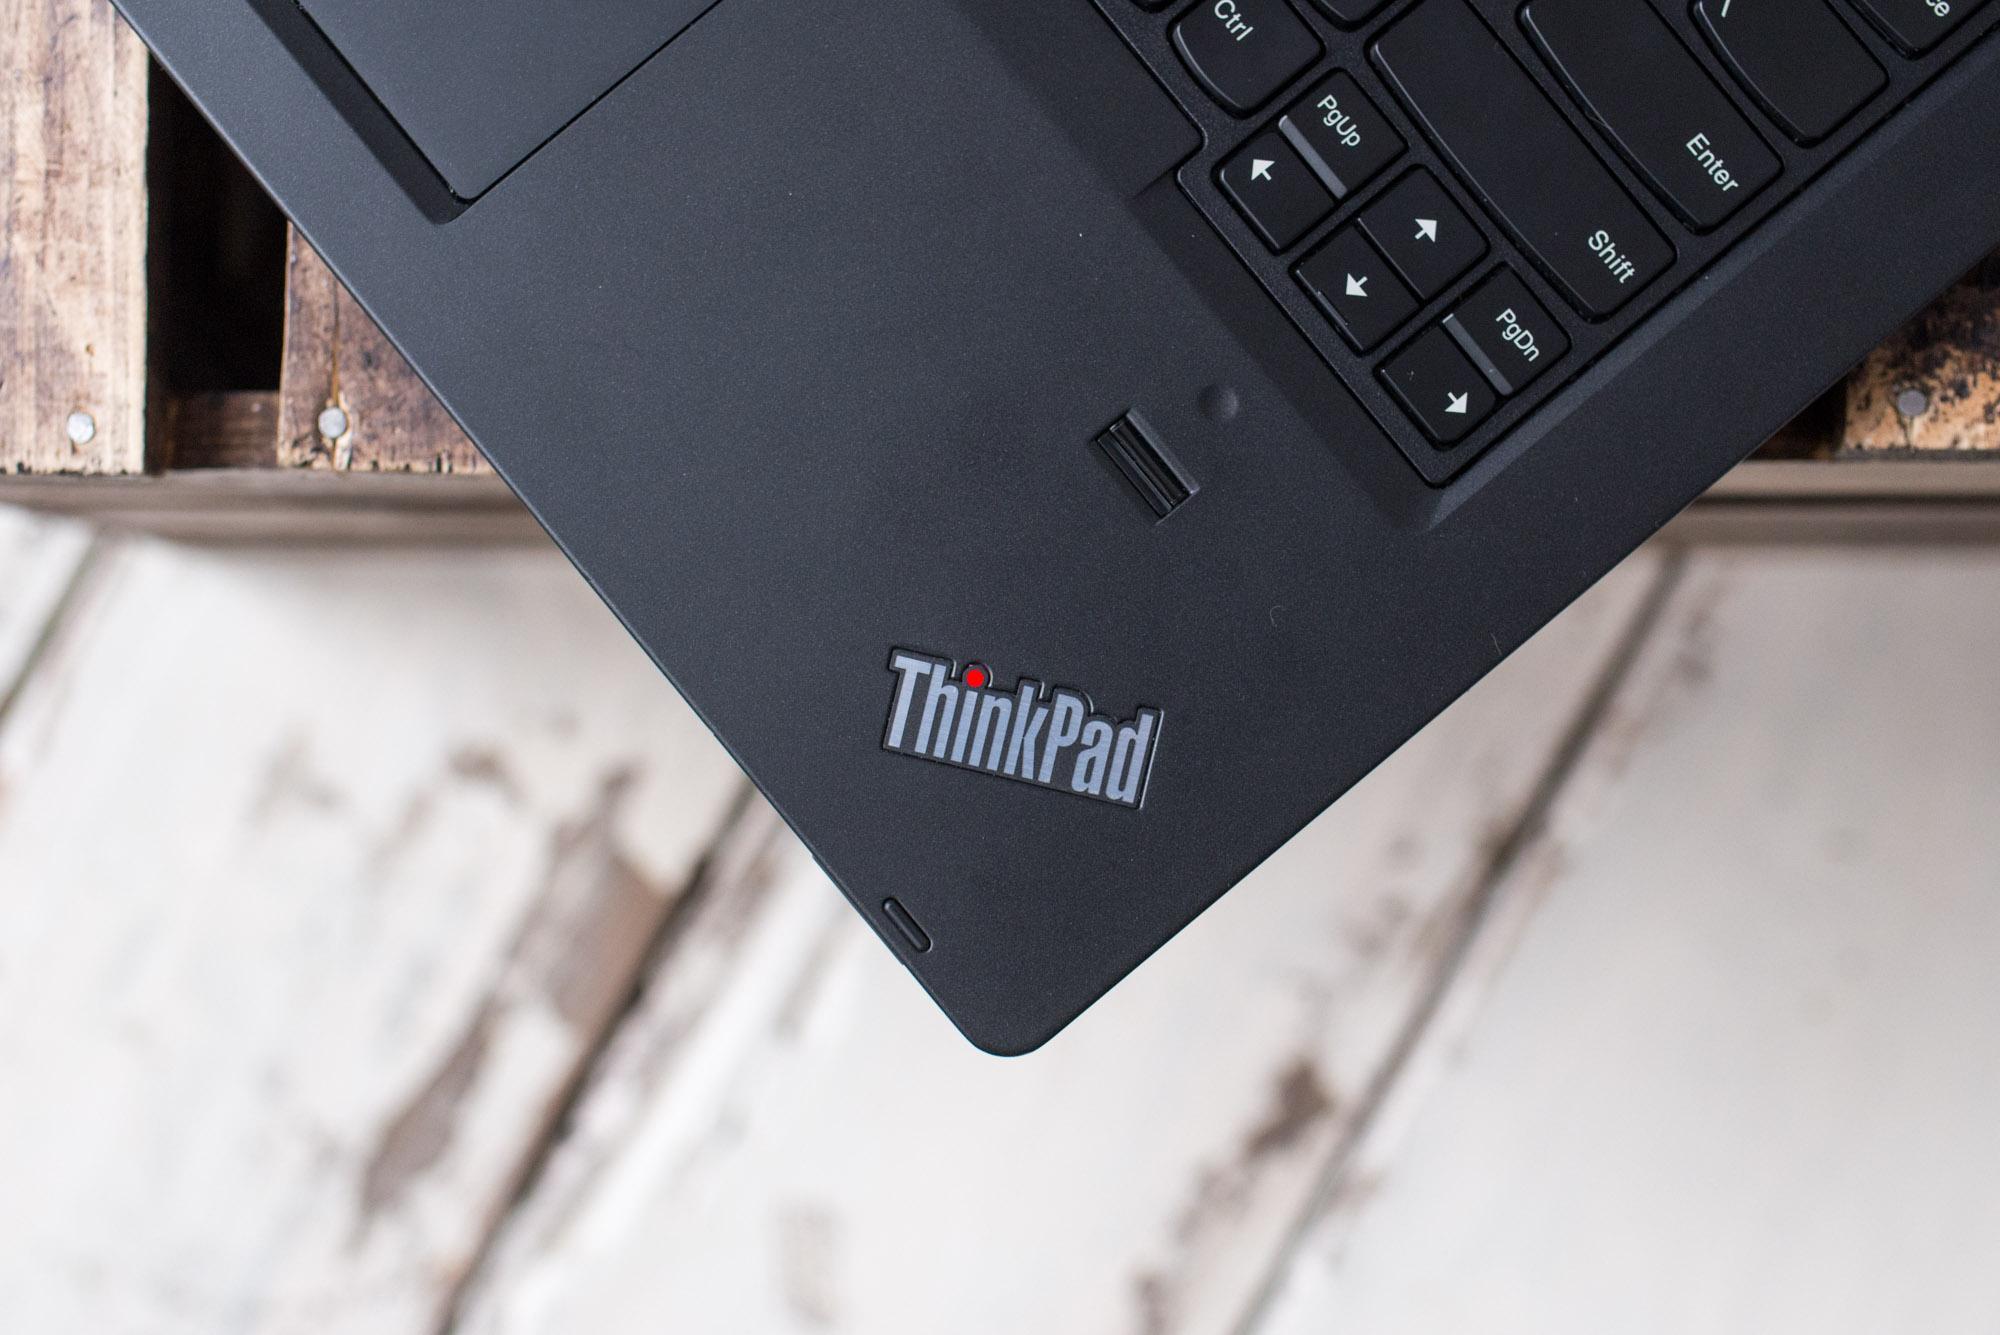 Thinkpad-P40-yoga--1